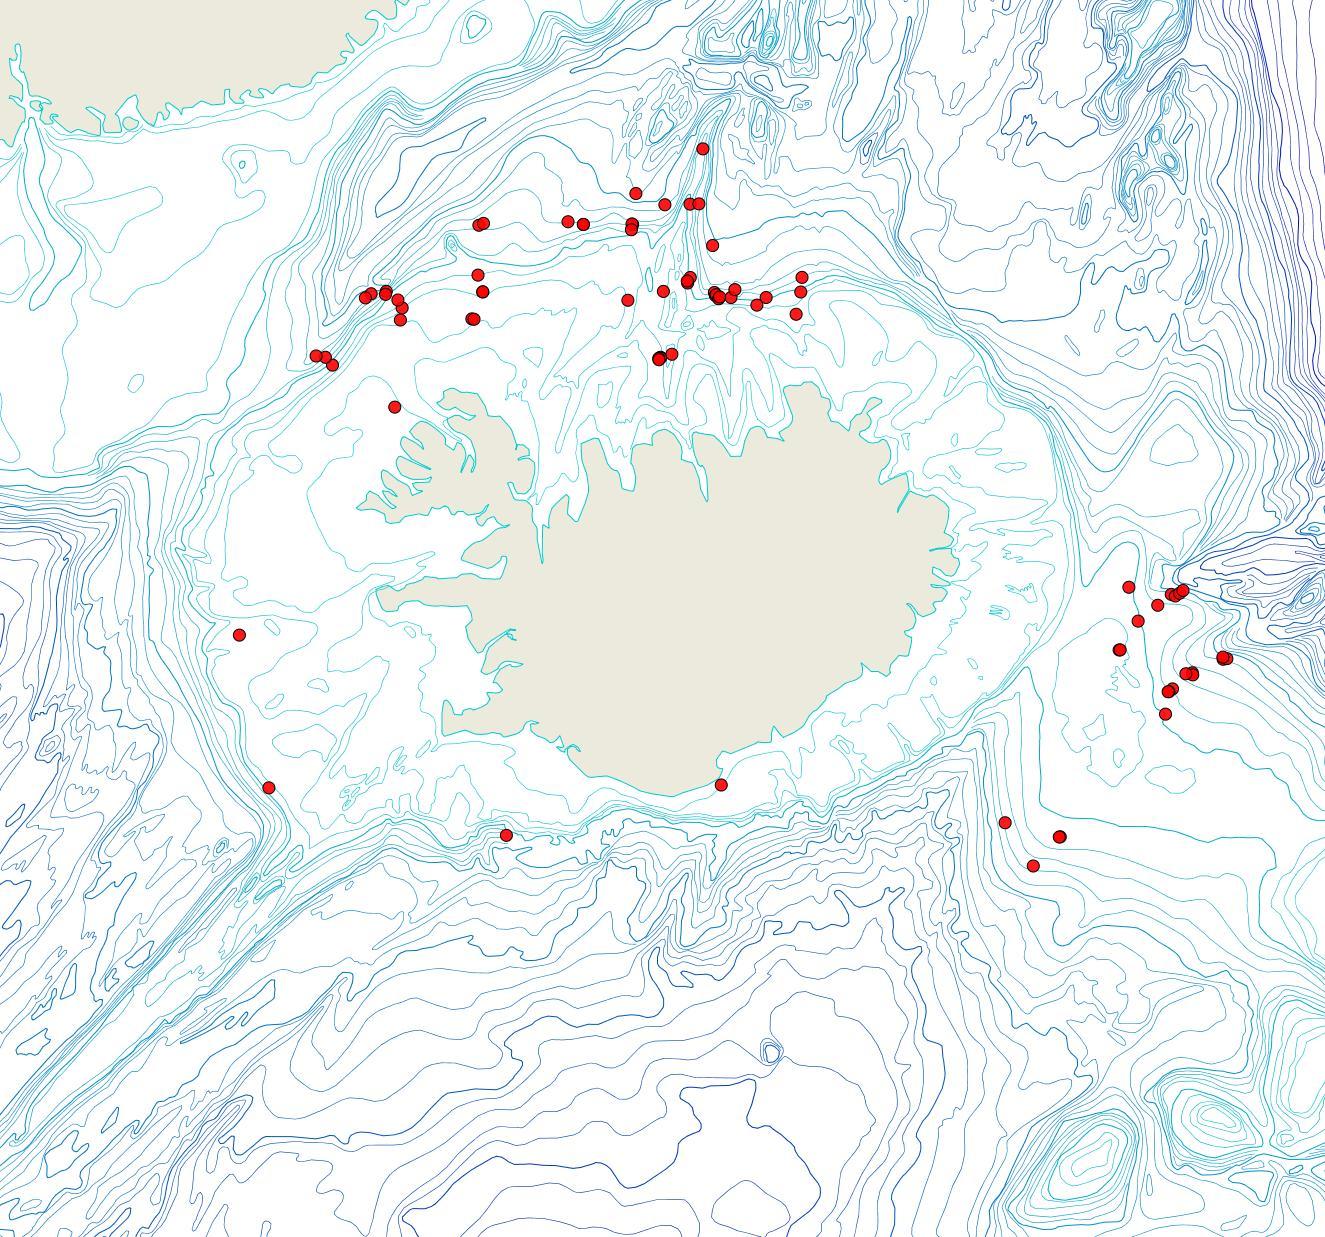 Útbreiðsla Notoplites evocatus(Bioice samples, red dots)